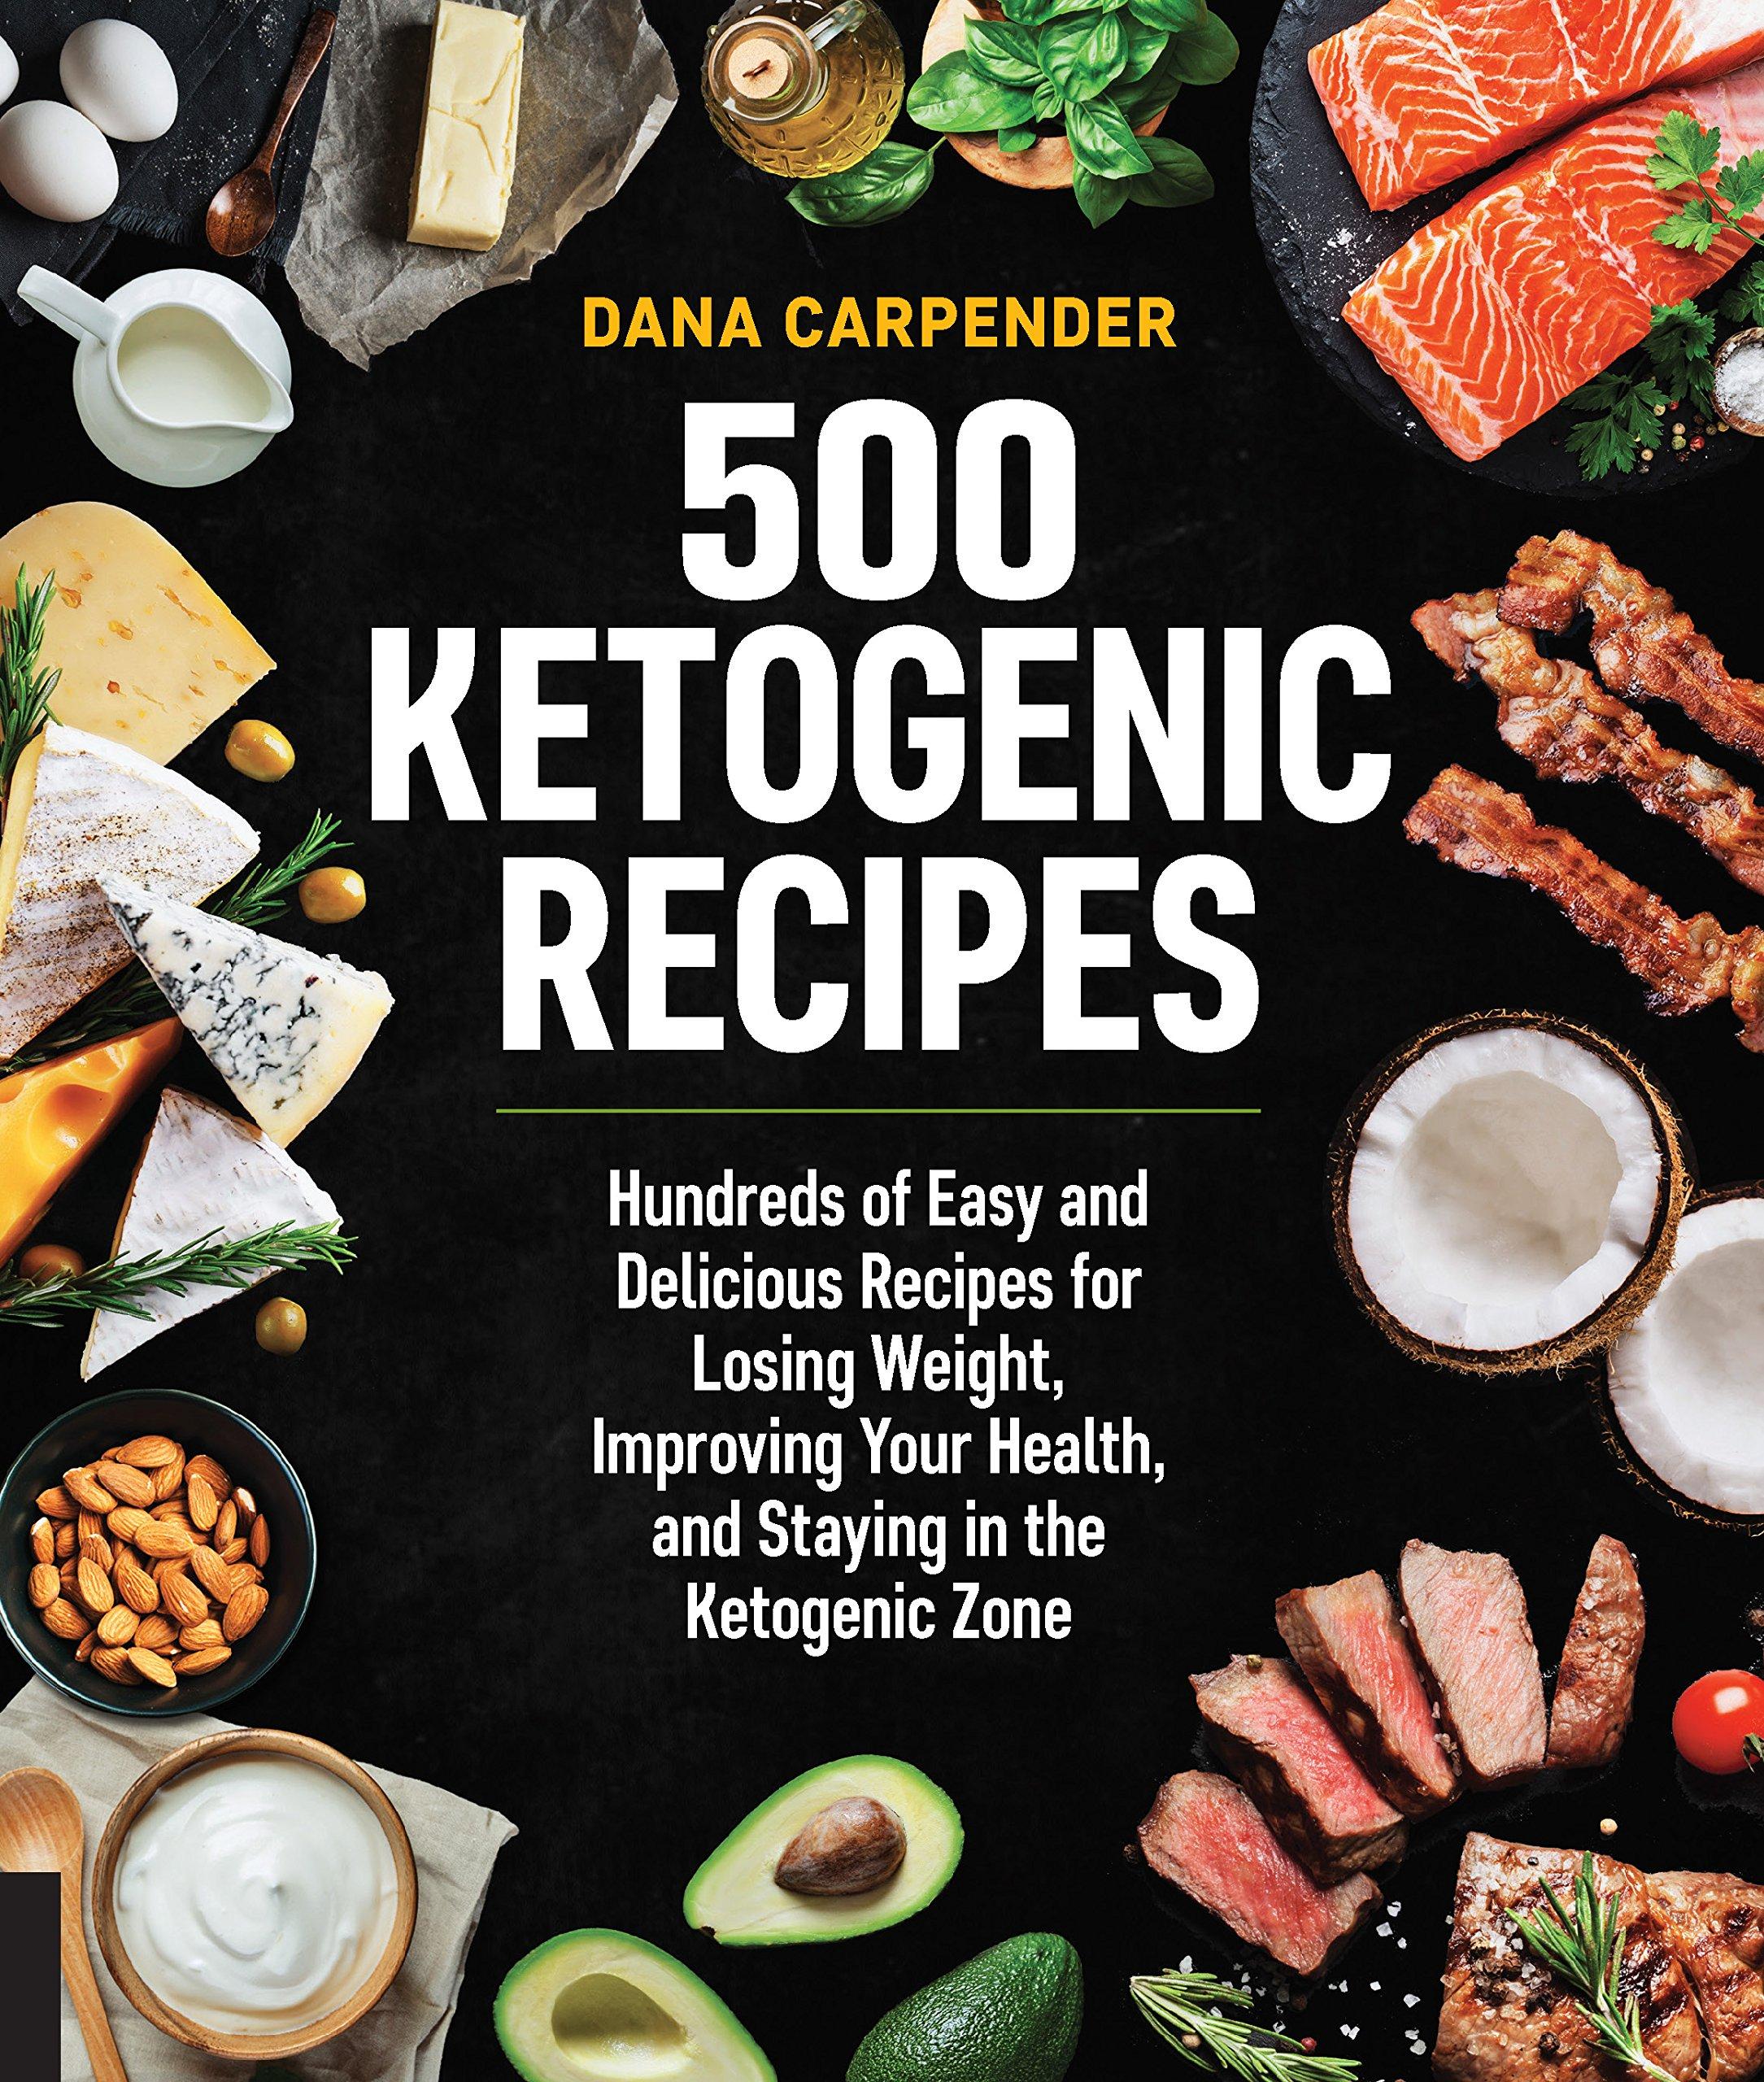 500 Ketogenic Recipes Delicious Improving